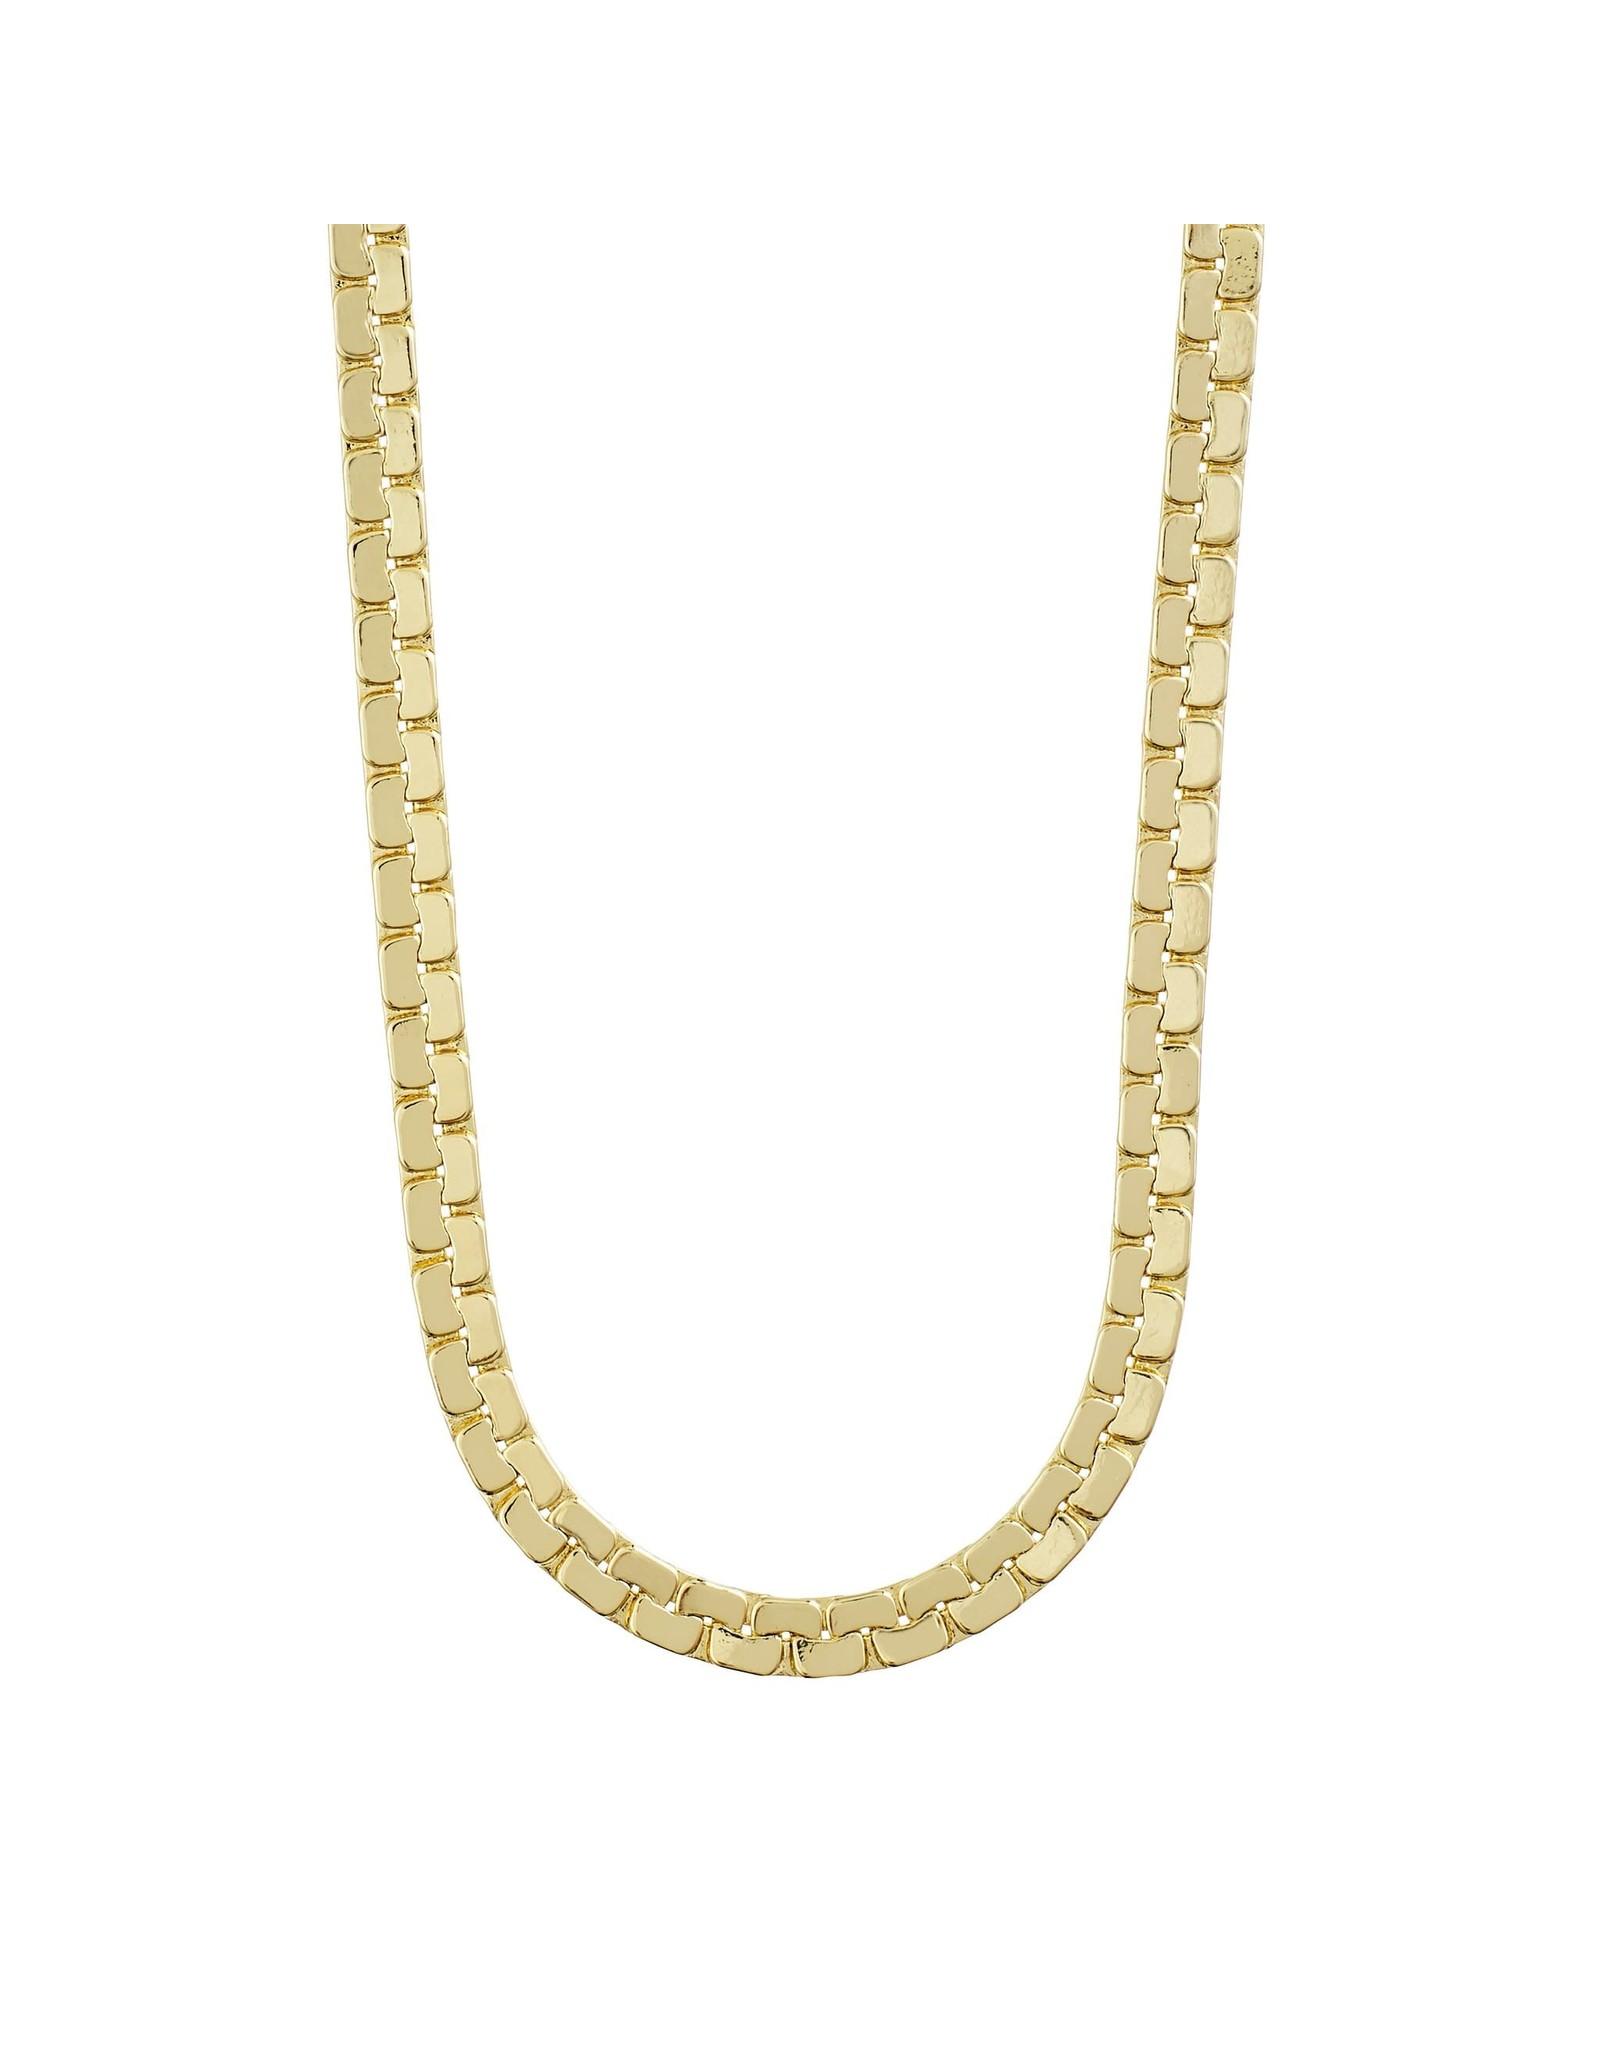 Pilgrim Pilgrim Beauty Necklace Gold Plated II